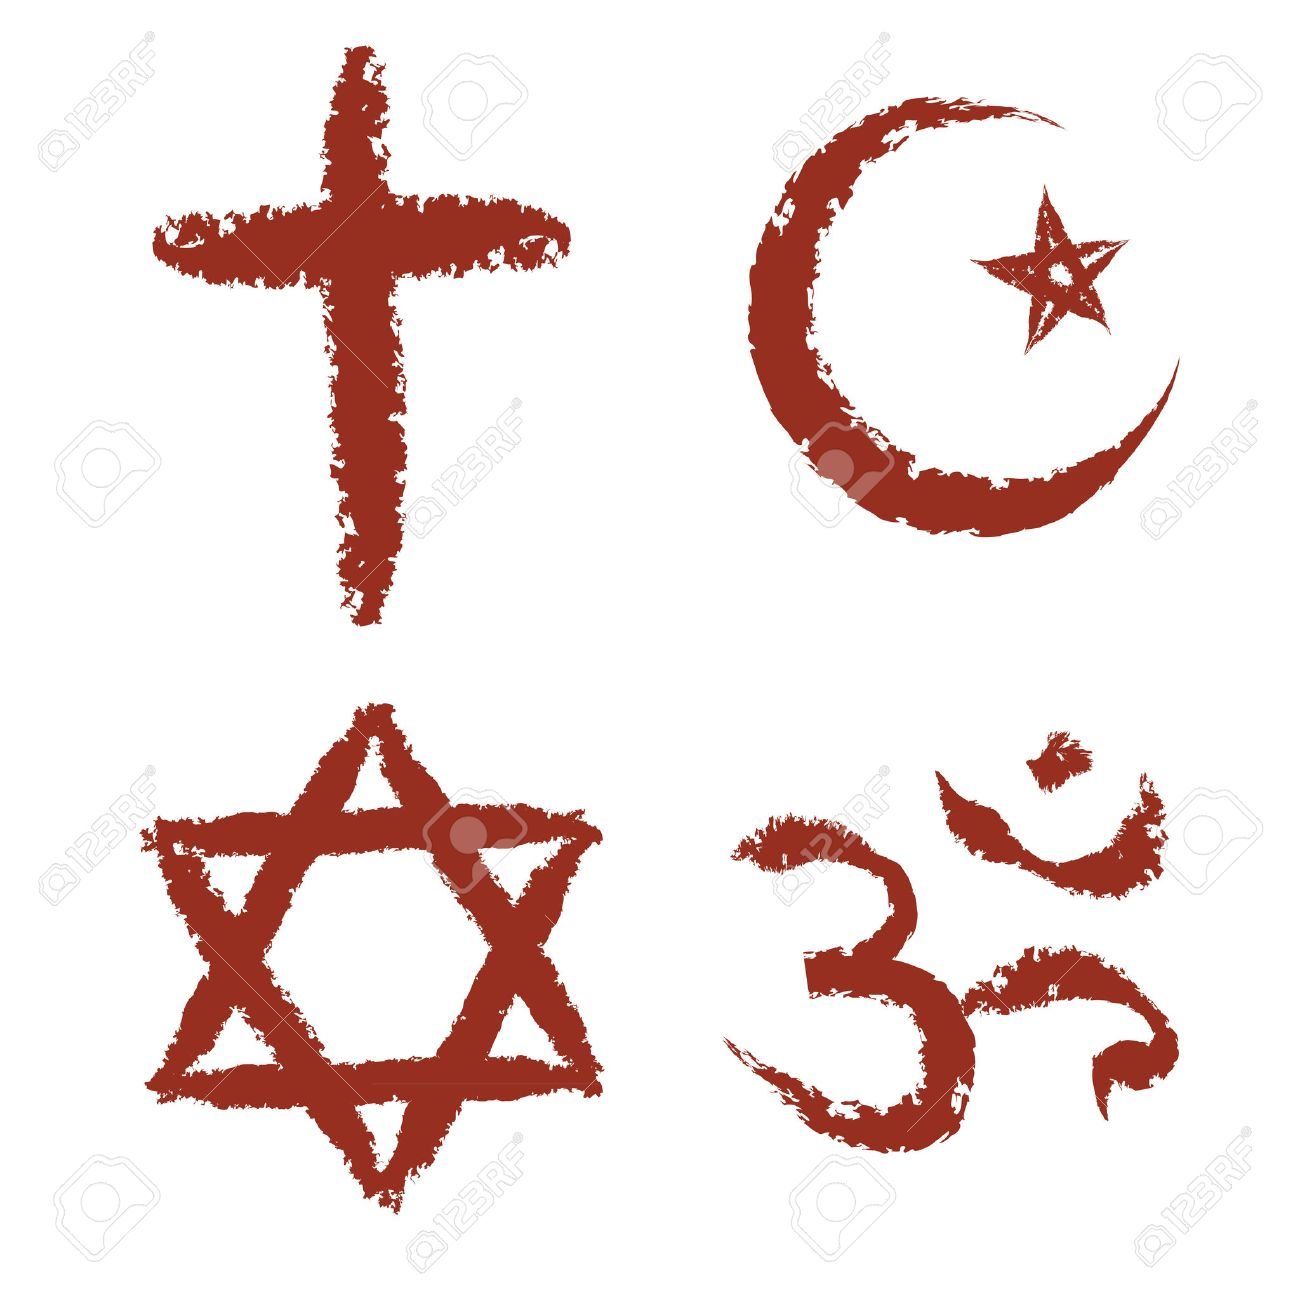 Christian islam judaism and hinduism religions painted signs christian islam judaism and hinduism religions painted signs vector set stock vector 23290375 buycottarizona Image collections